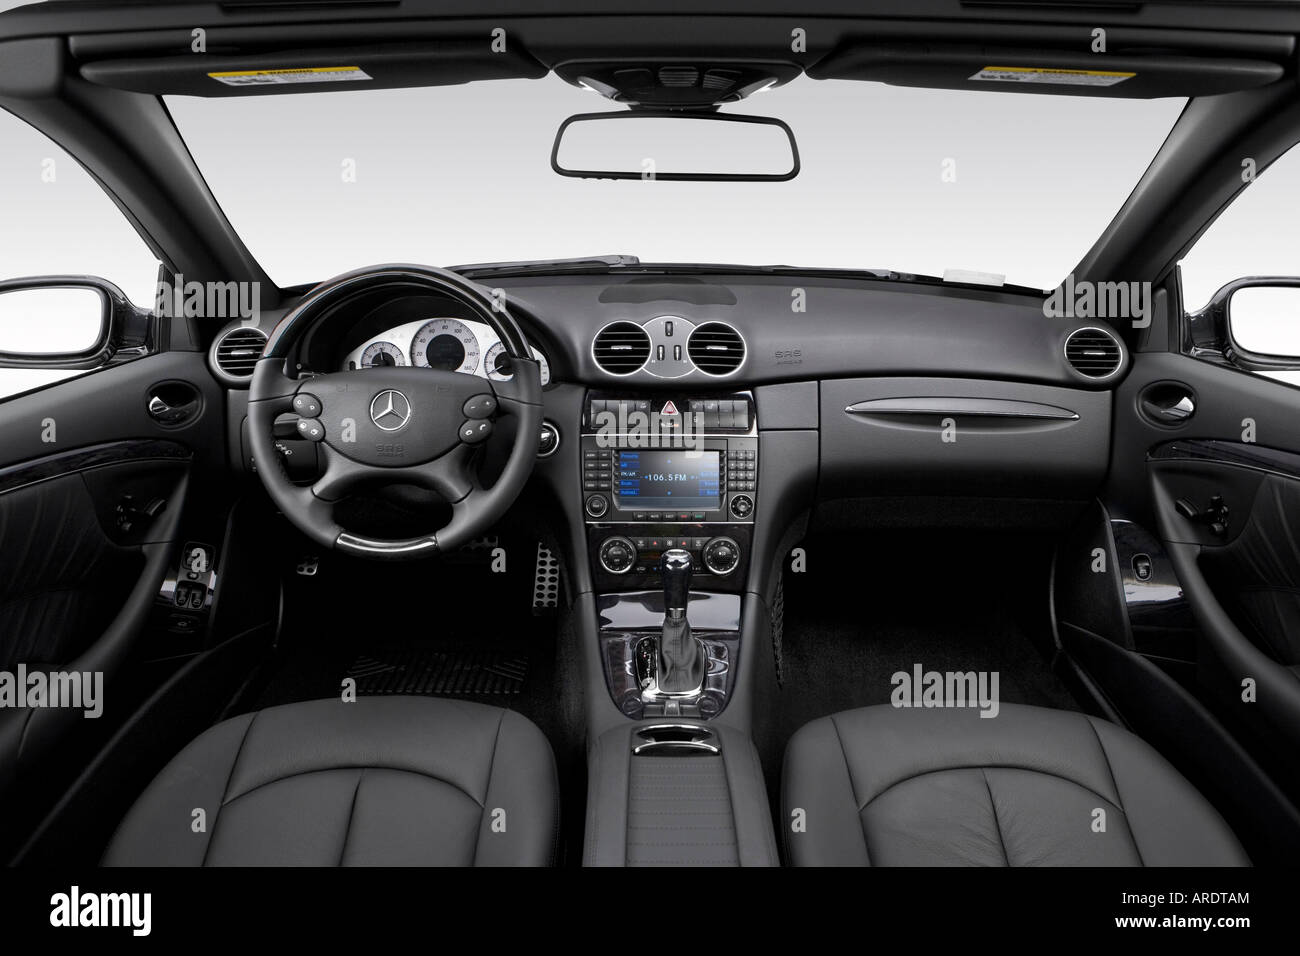 2007 mercedes benz clk350 in black dashboard center console gear shifter view